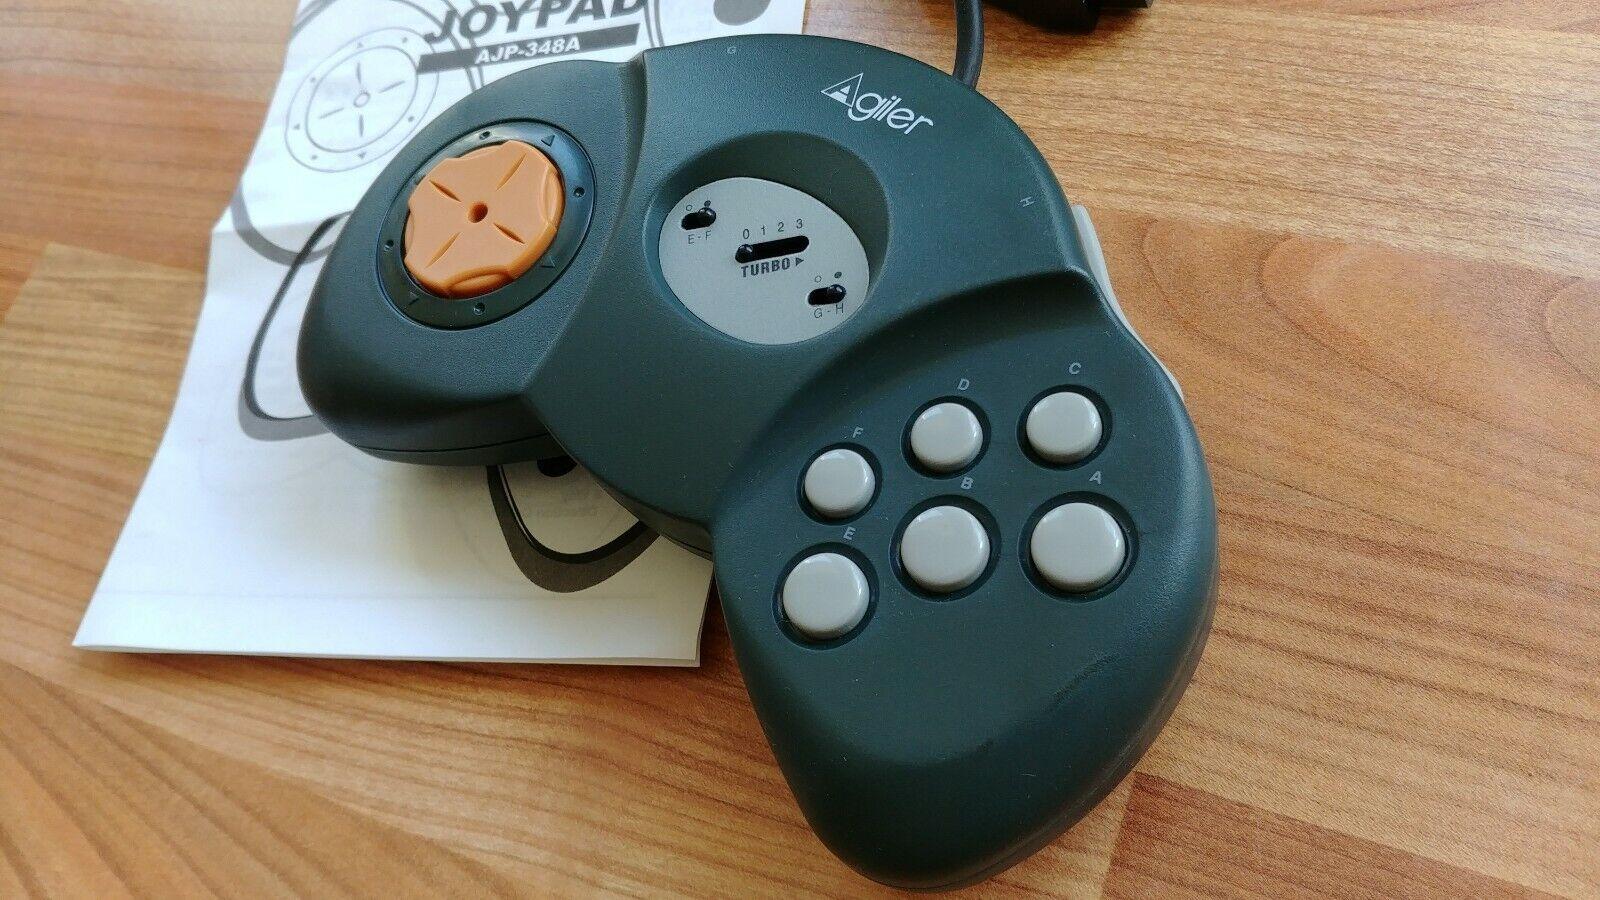 Agiler Joypad AJP-348A Controller Game Joystick - BOXED - IBM PC 15 pins